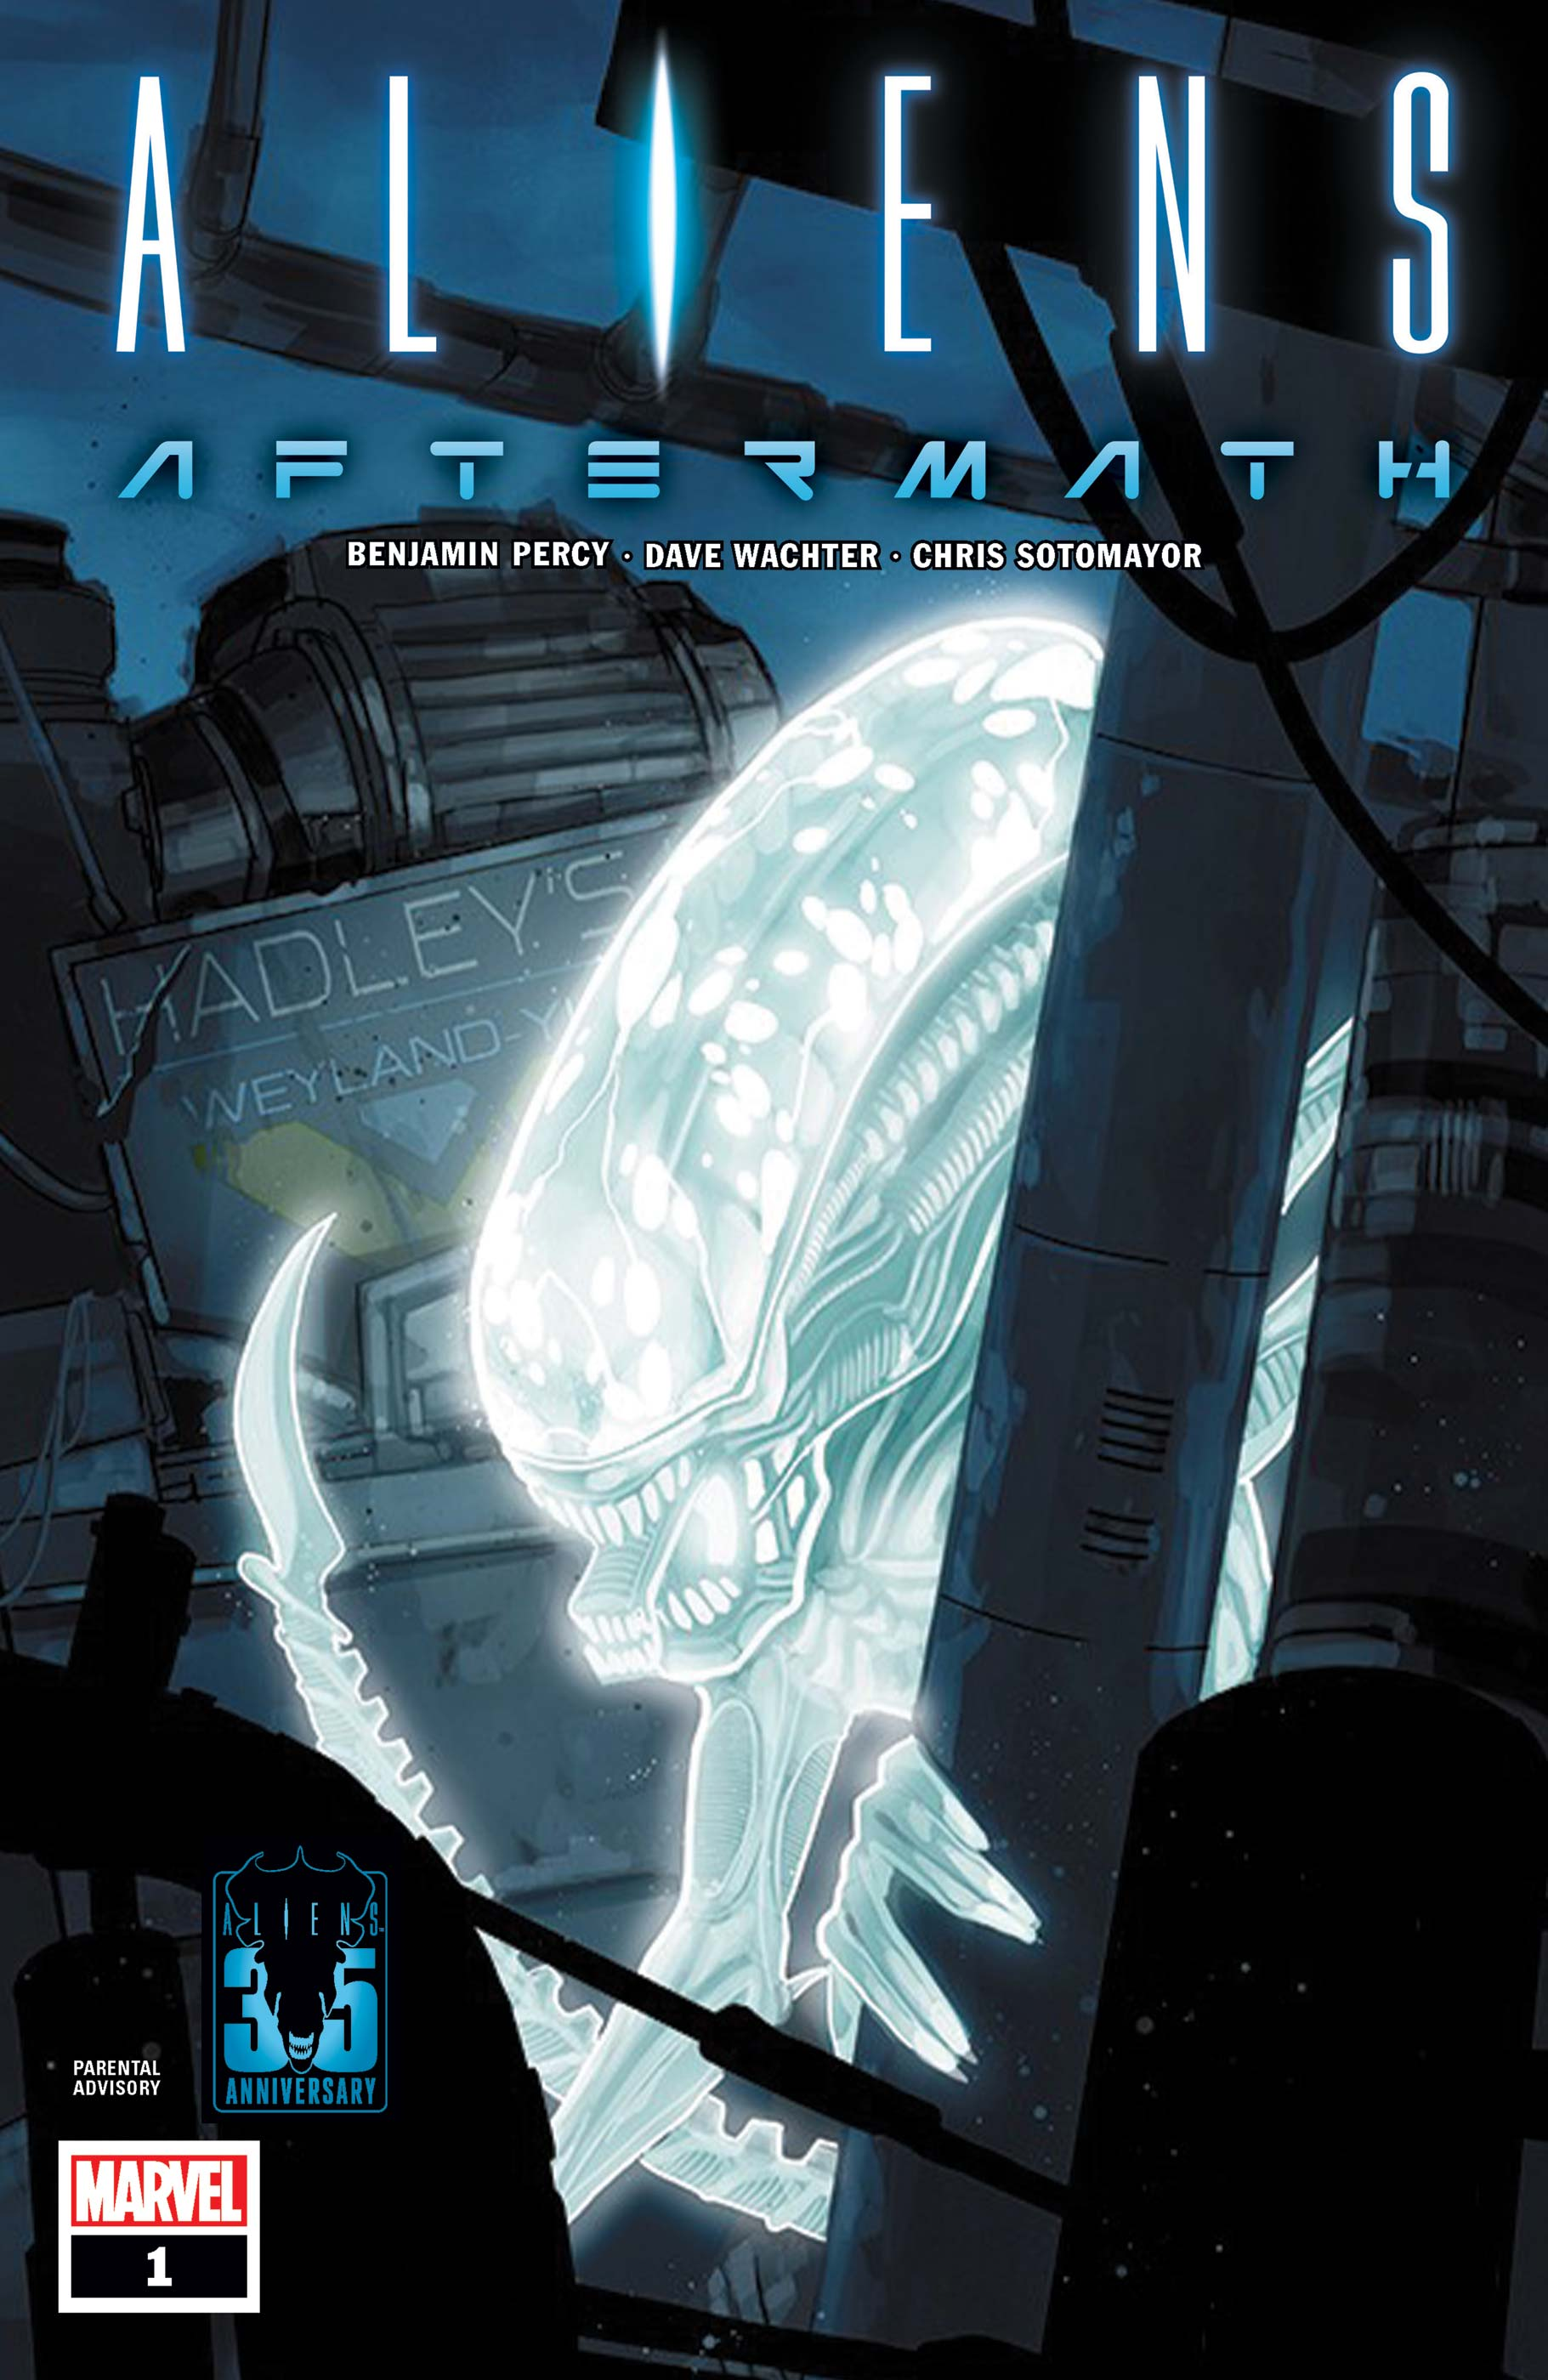 Aliens: Aftermath #1 (of 1) by Benjamin Percy